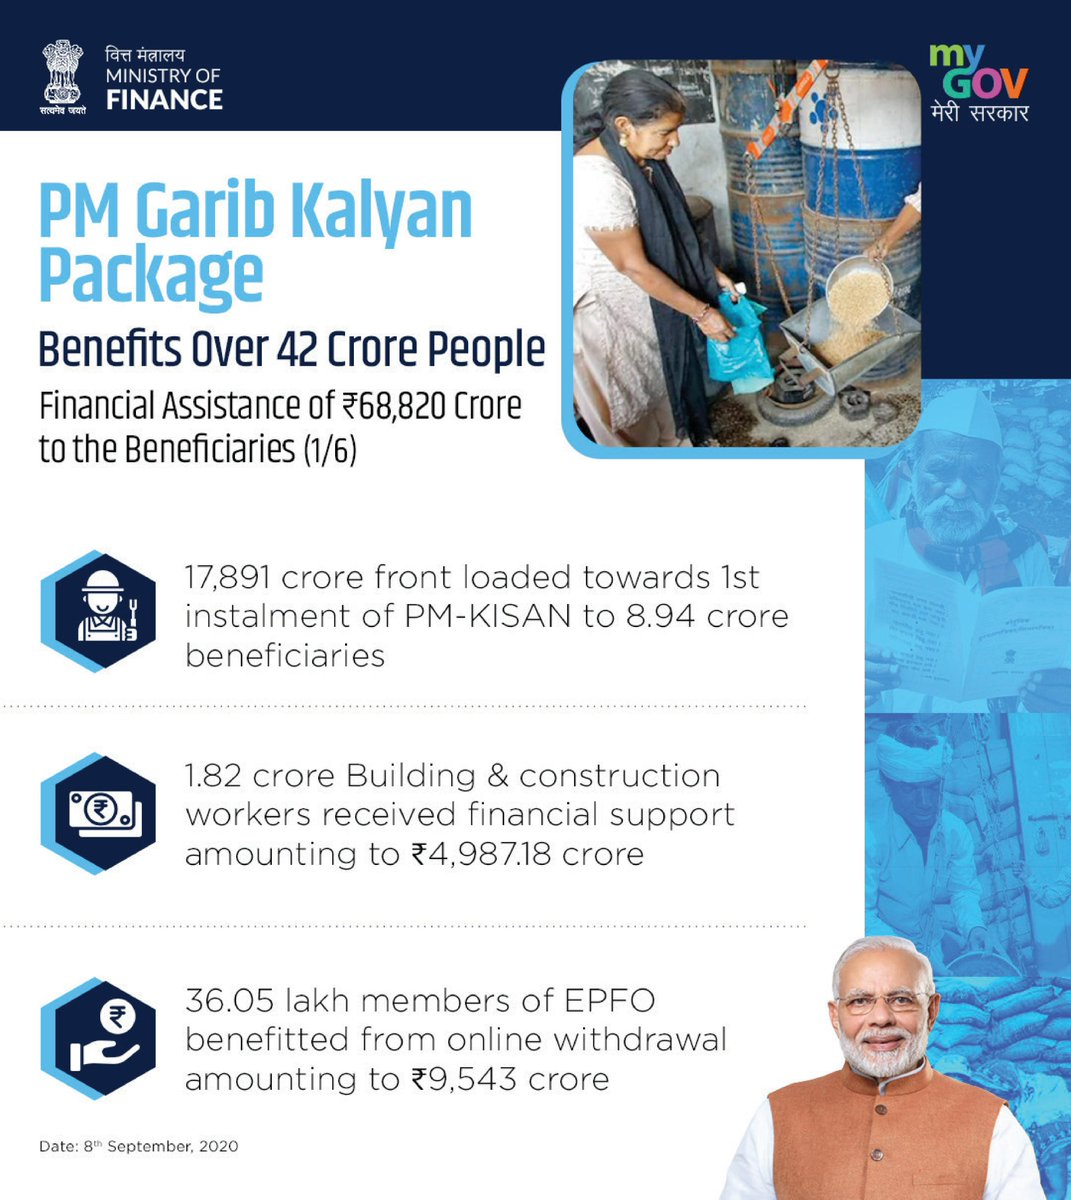 Government has provided financial assistance of Rs 68,820 Crore to over 42 Crore people under PM Garib Kalyan Yojana. Take a look! #AatmaNirbharBharat #TransformingIndia